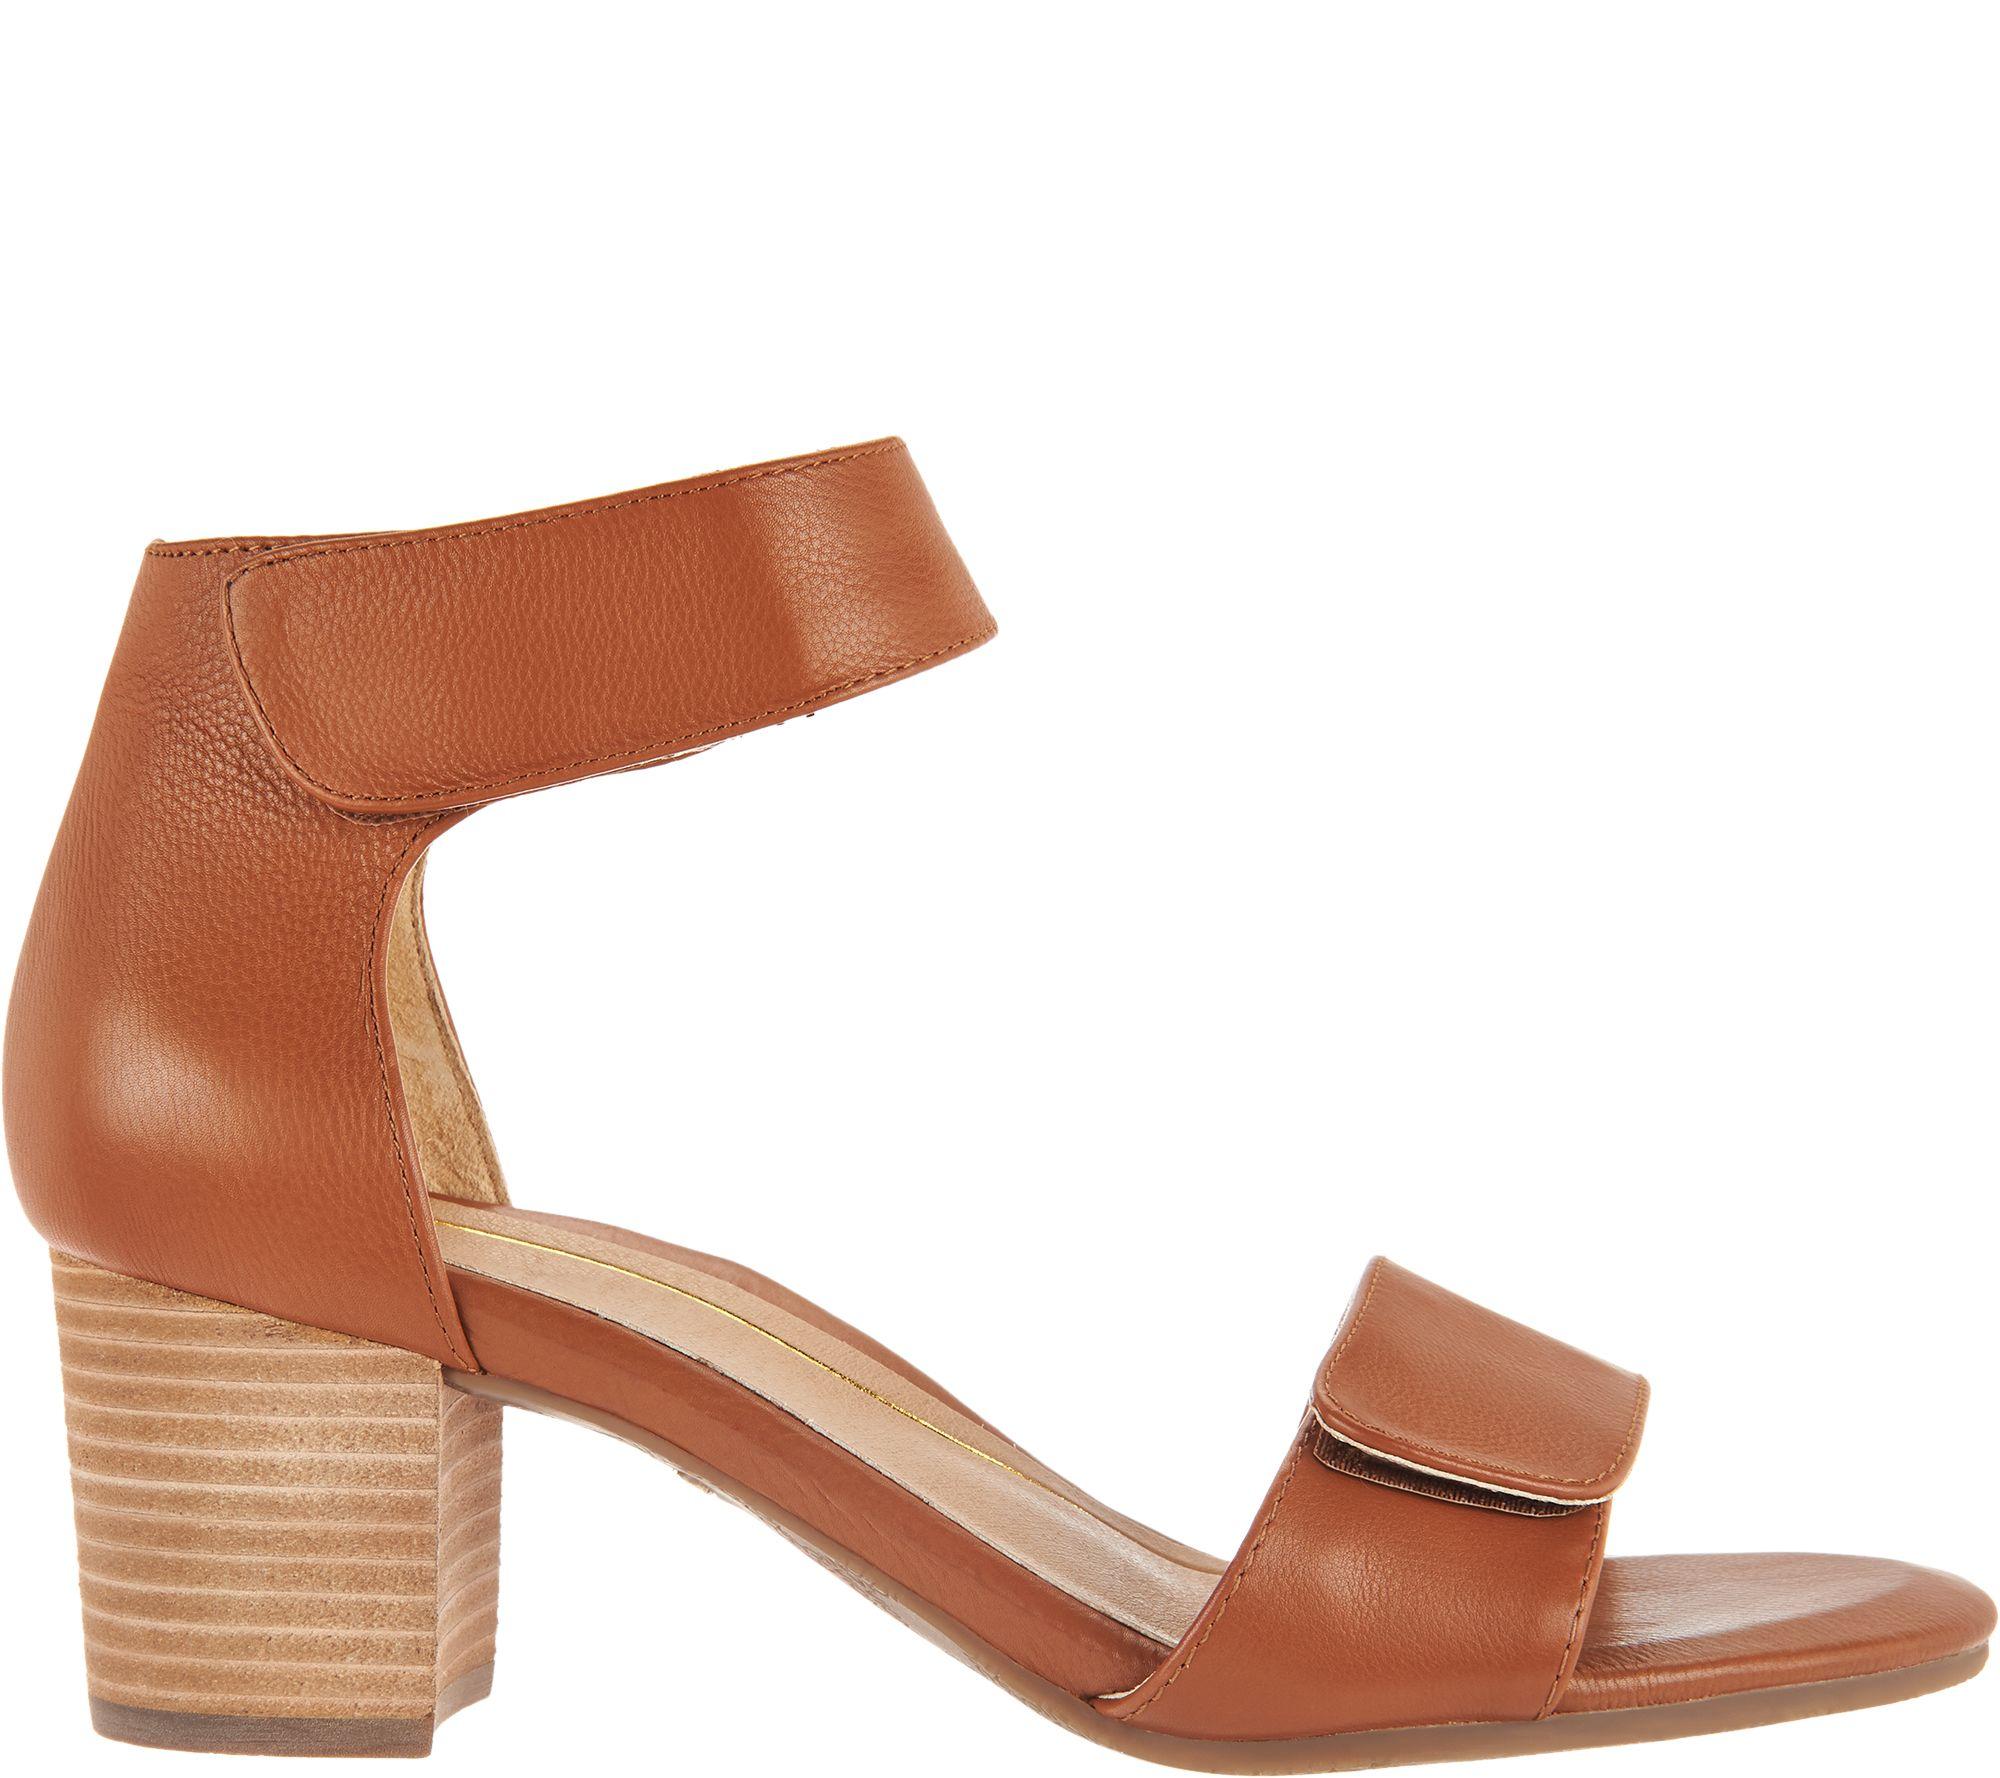 ff7929a88 Vionic Block Heel Leather Sandals - Solana - Page 1 — QVC.com